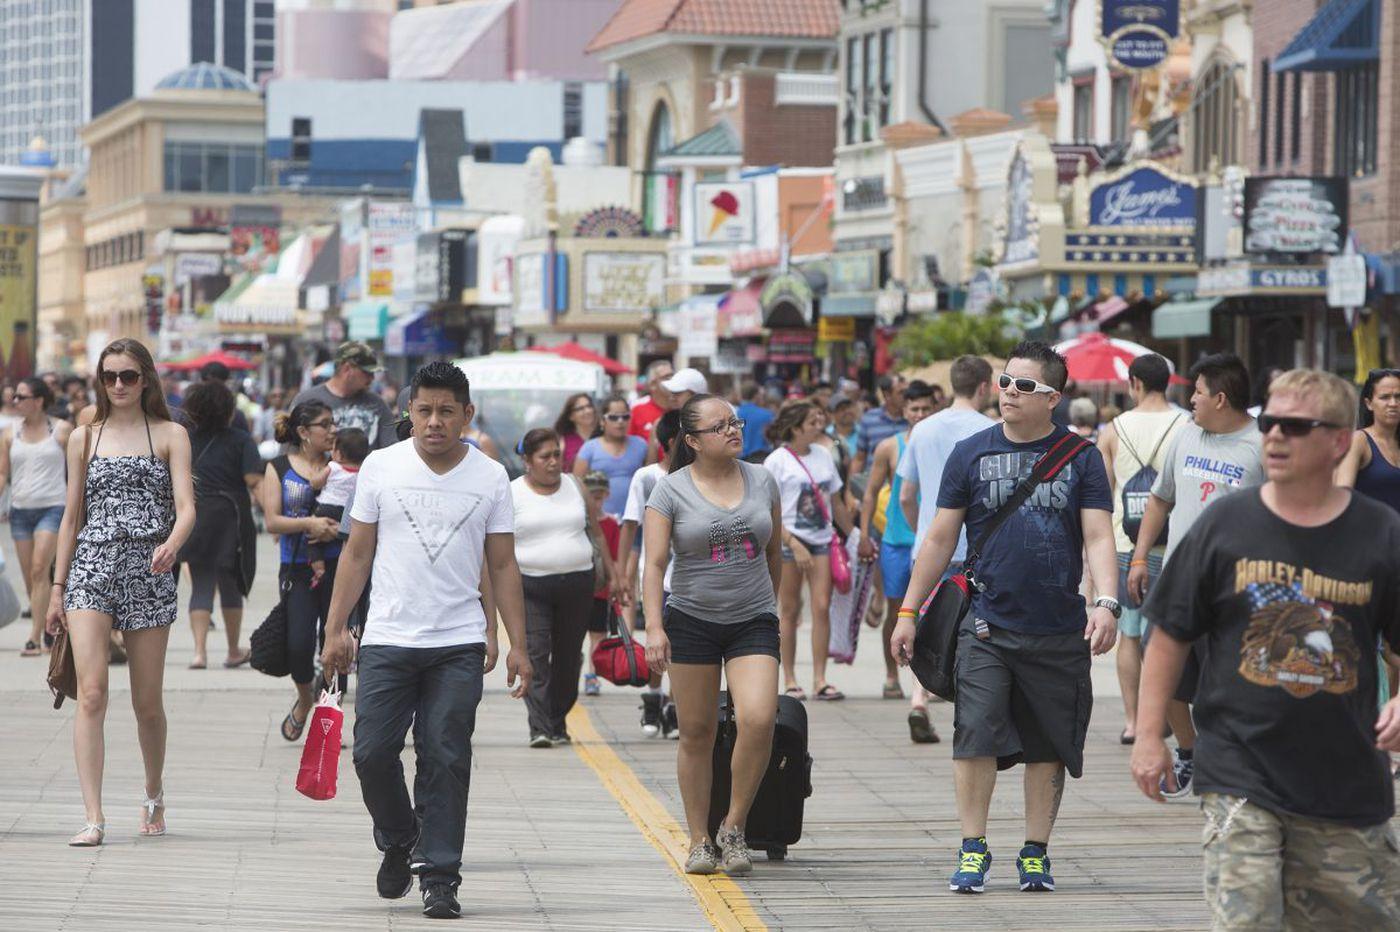 Judge halts Christie's Atlantic City police layoffs